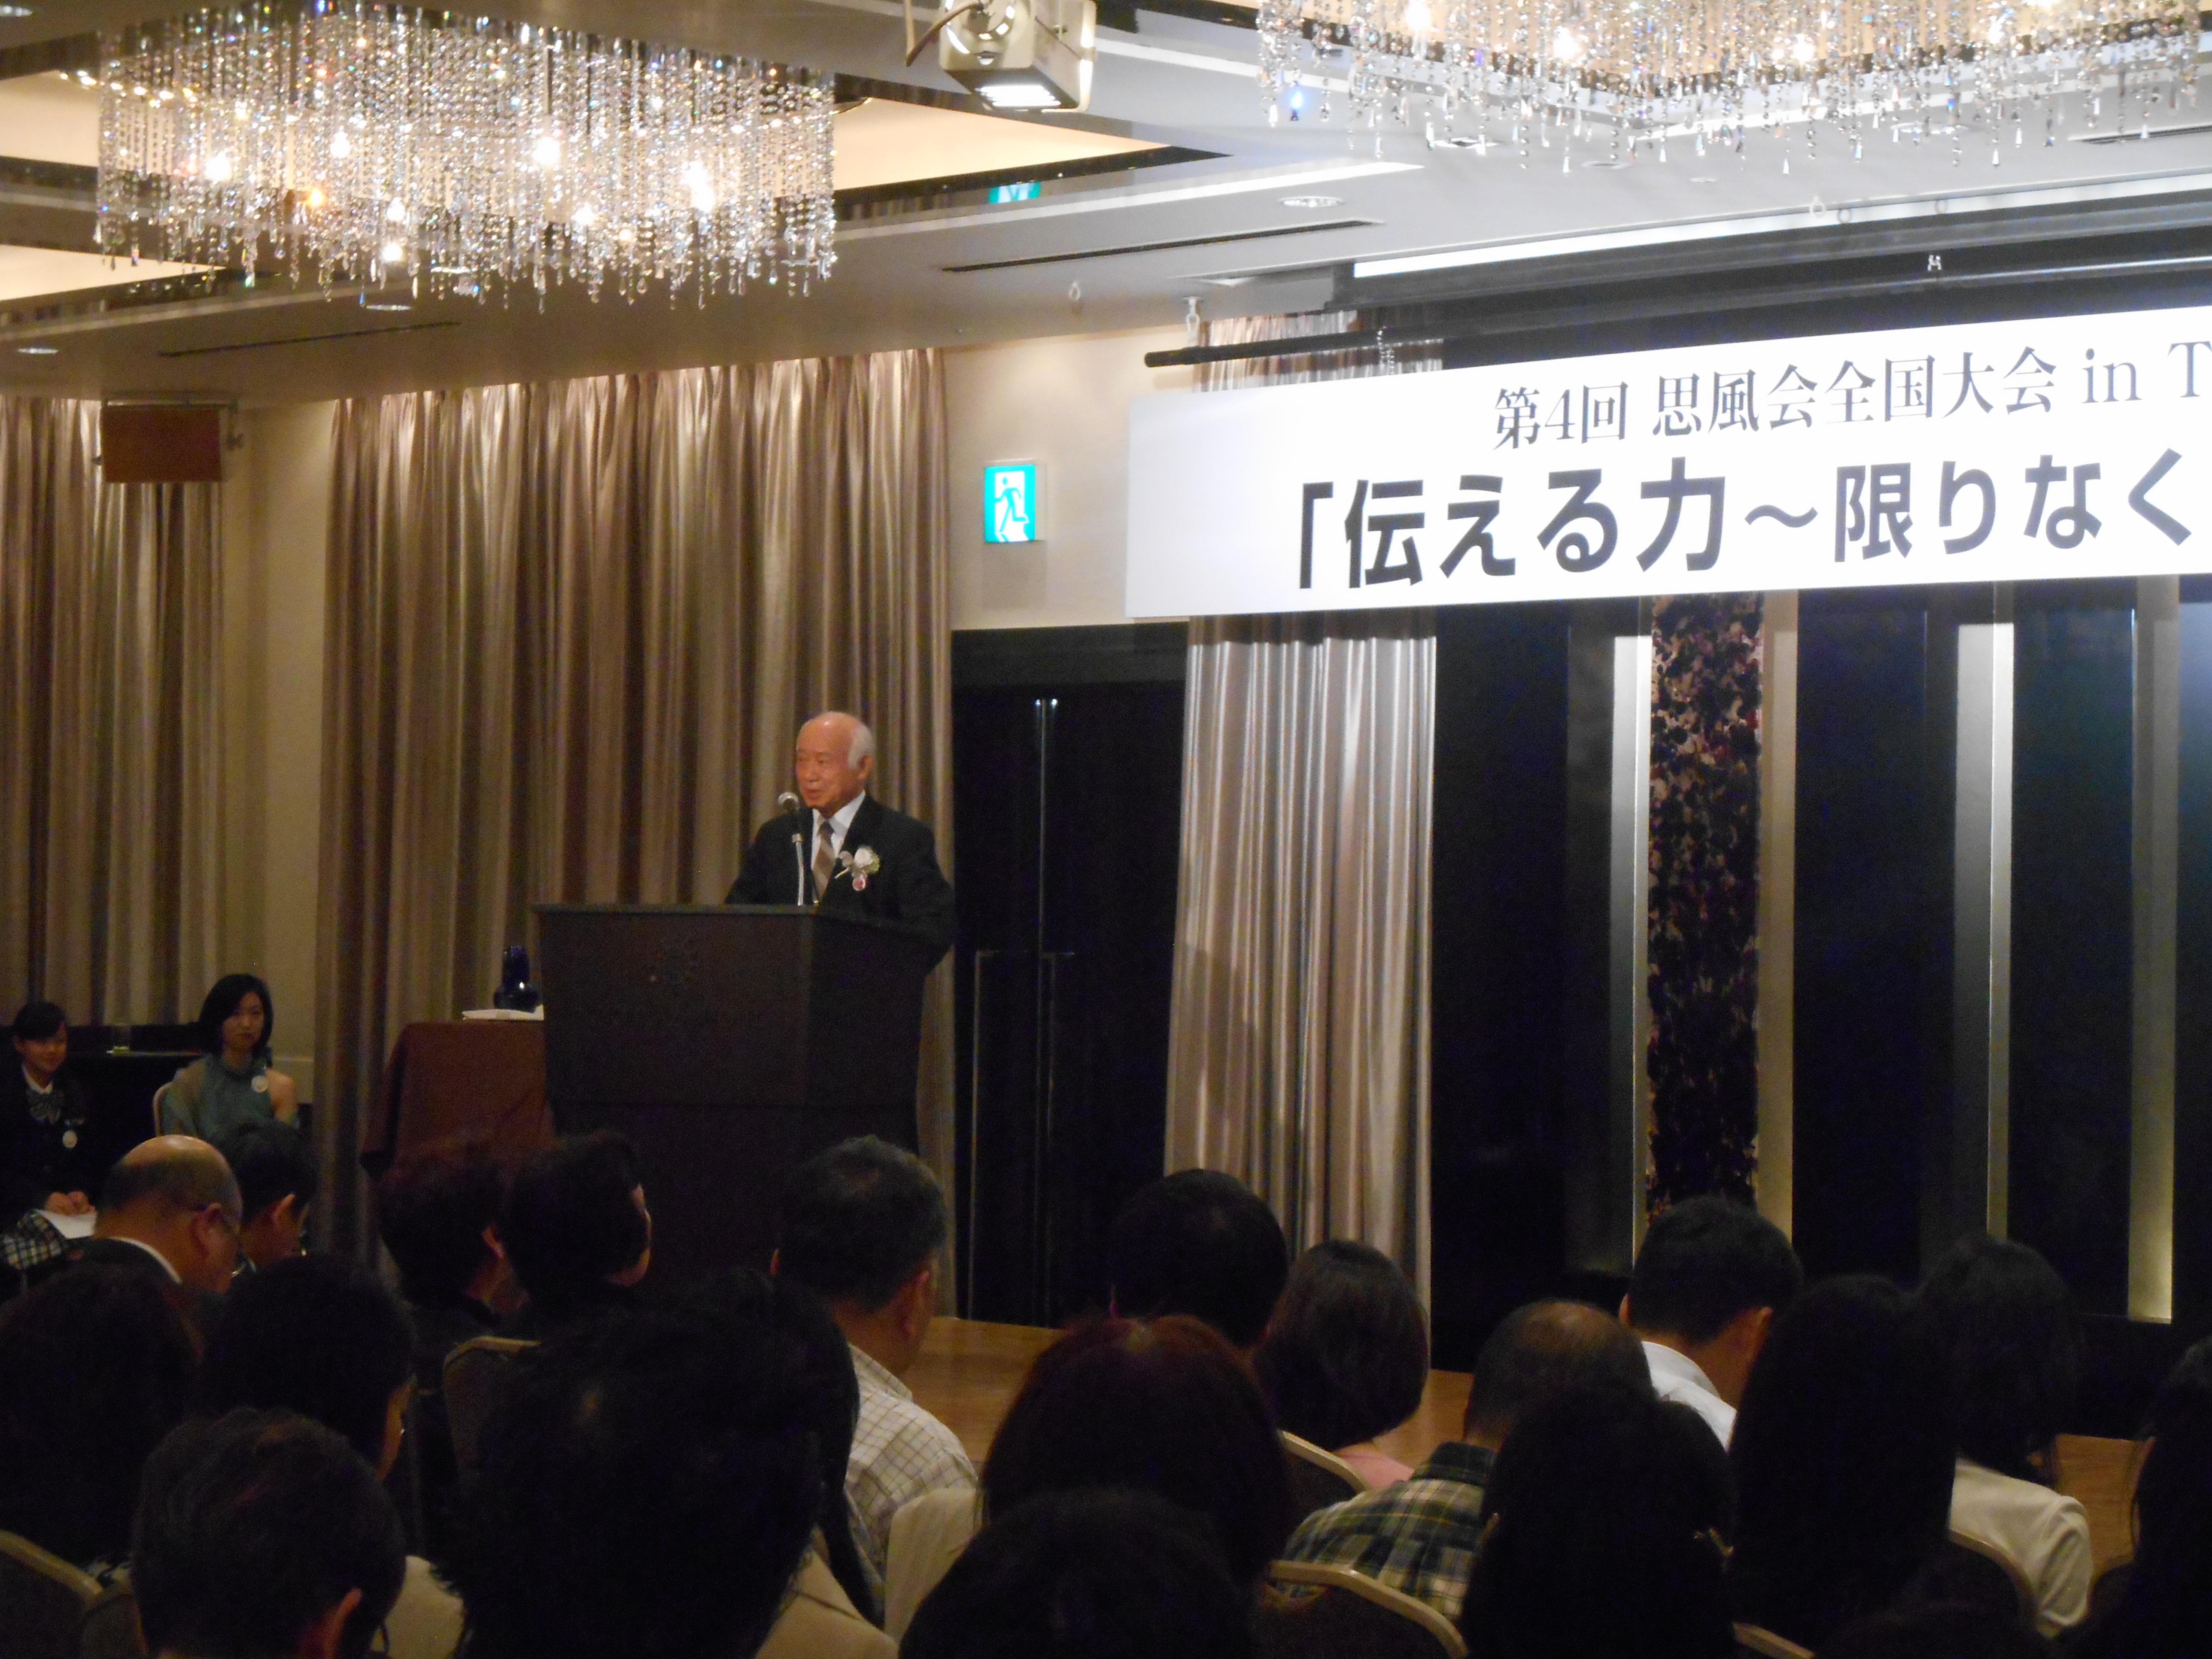 DSCN2066 - 平成30年度 東京思風塾 4月7日(土)「時代が問題をつくり、問題が人物をつくる」